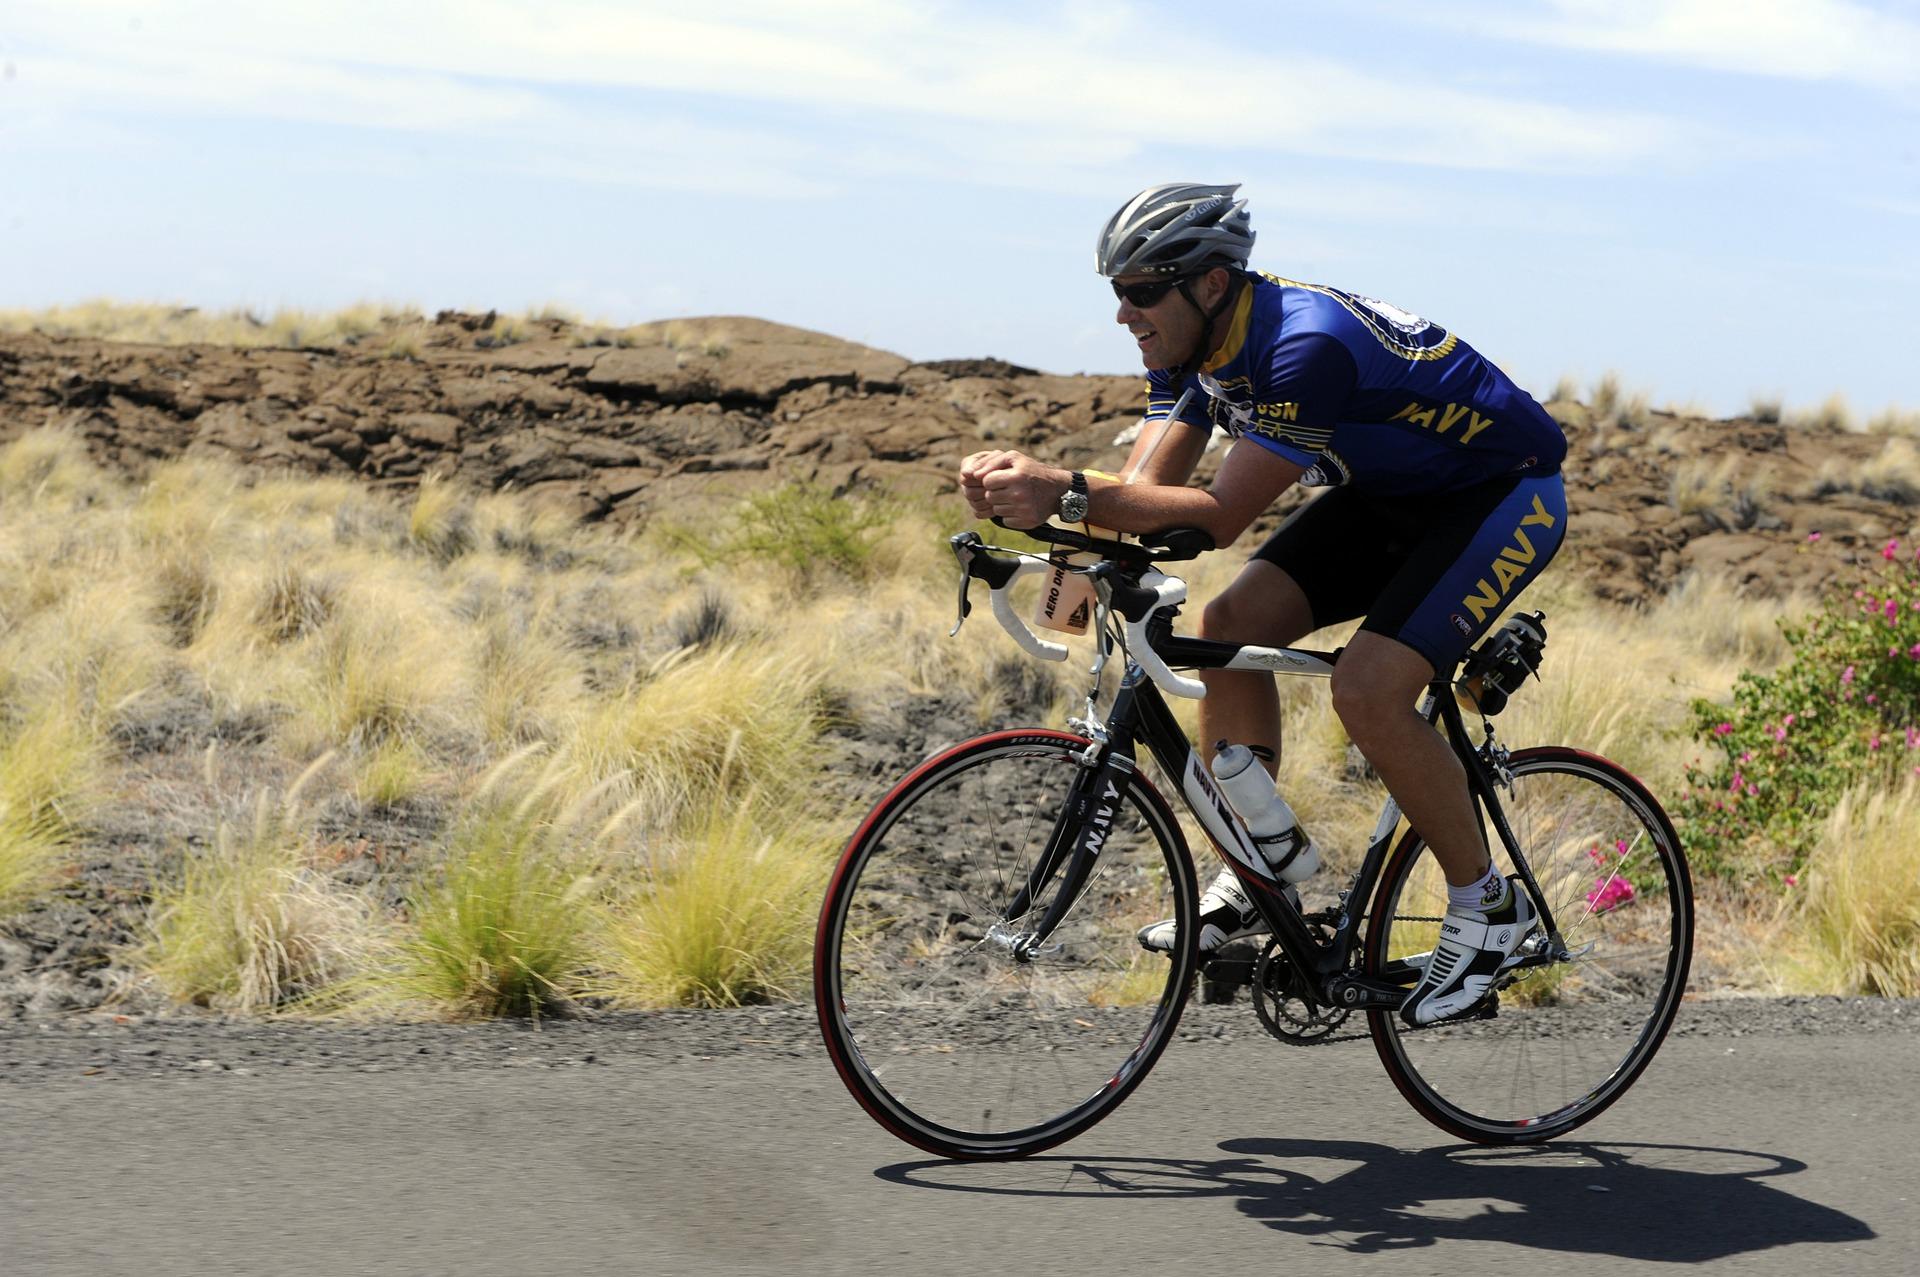 7 Best Bike Helmets Under $50- Ride Safe & Smart(Editor's Pick)